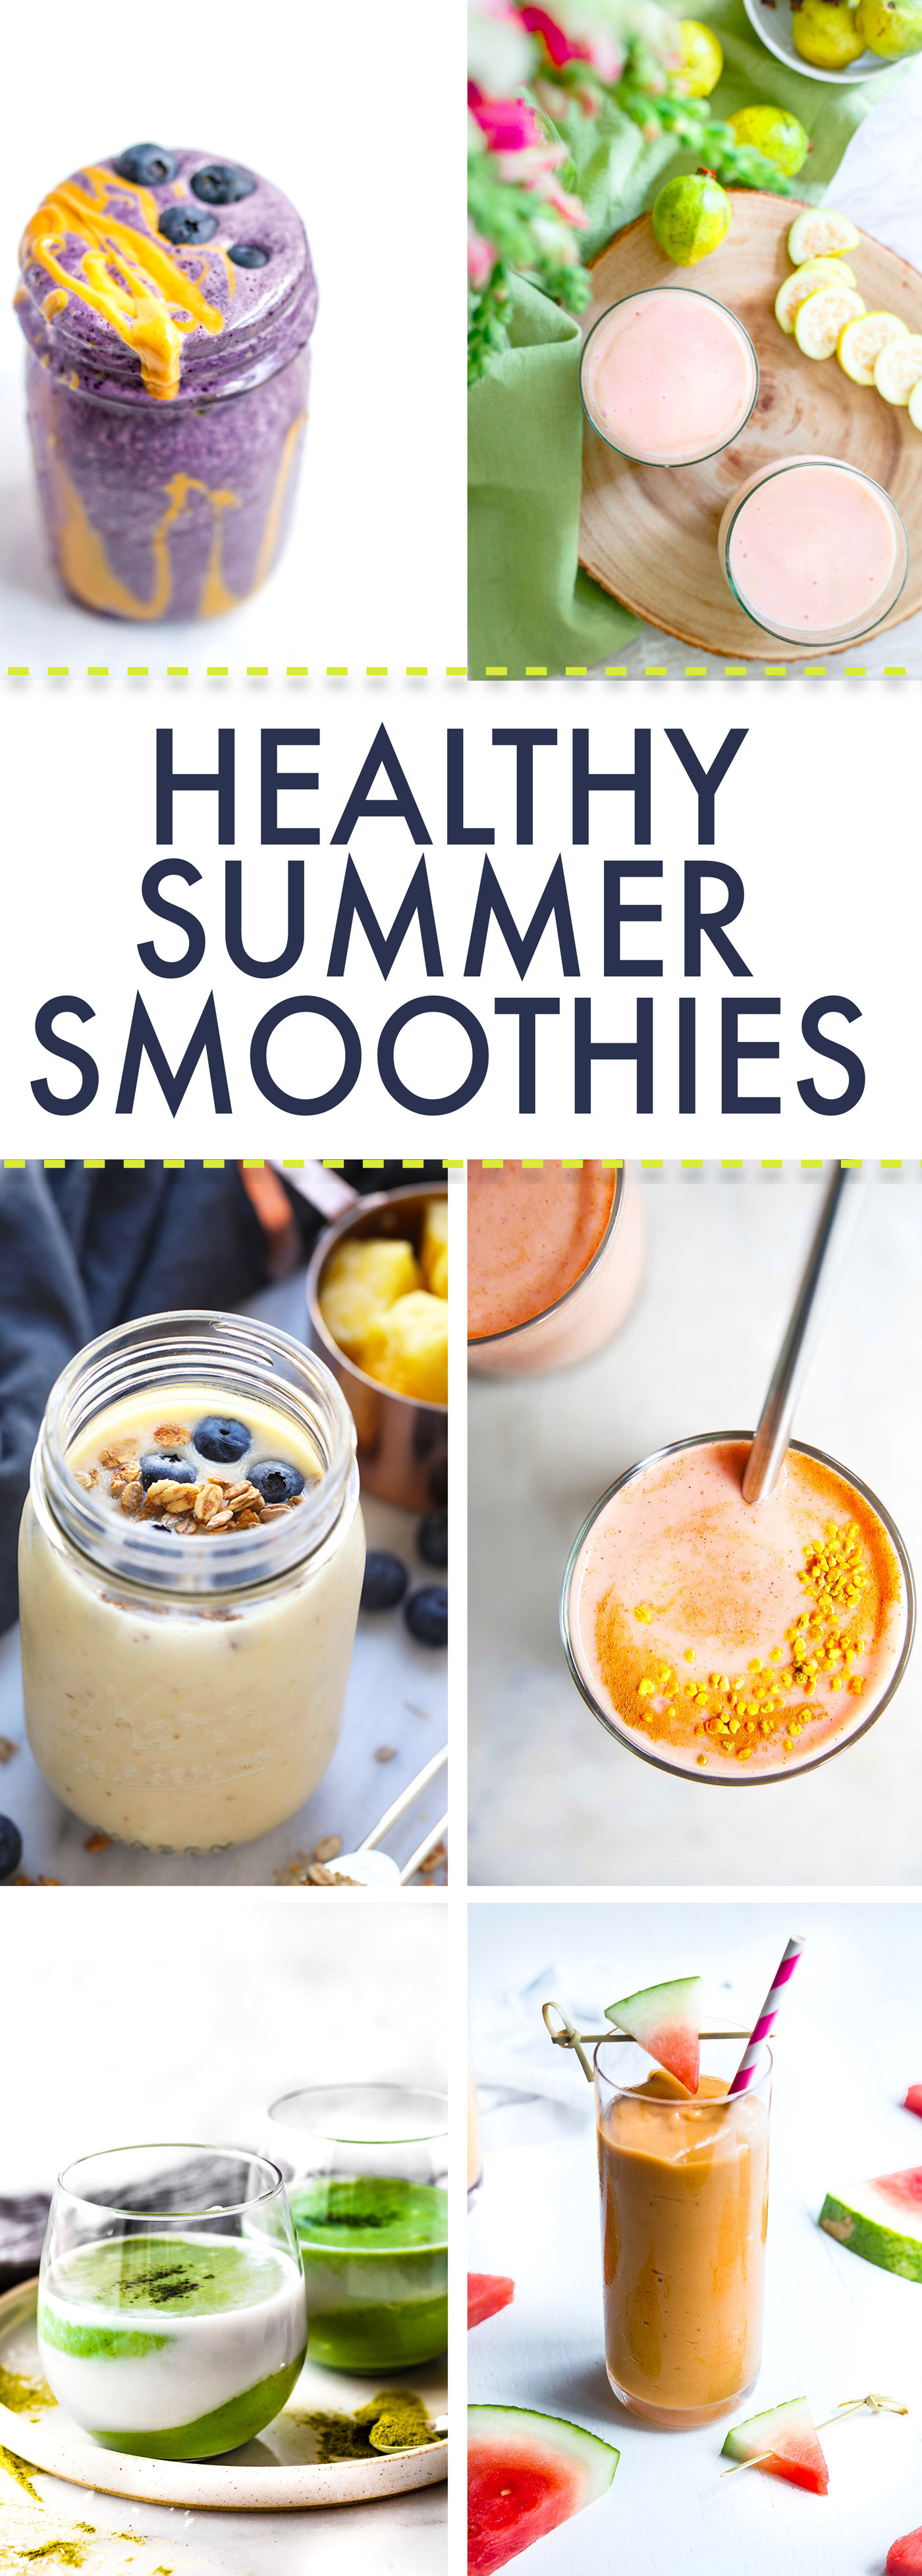 Healthy Summer Smoothies  Creamy Coconut Spirulina Superfood Smoothie Recipe